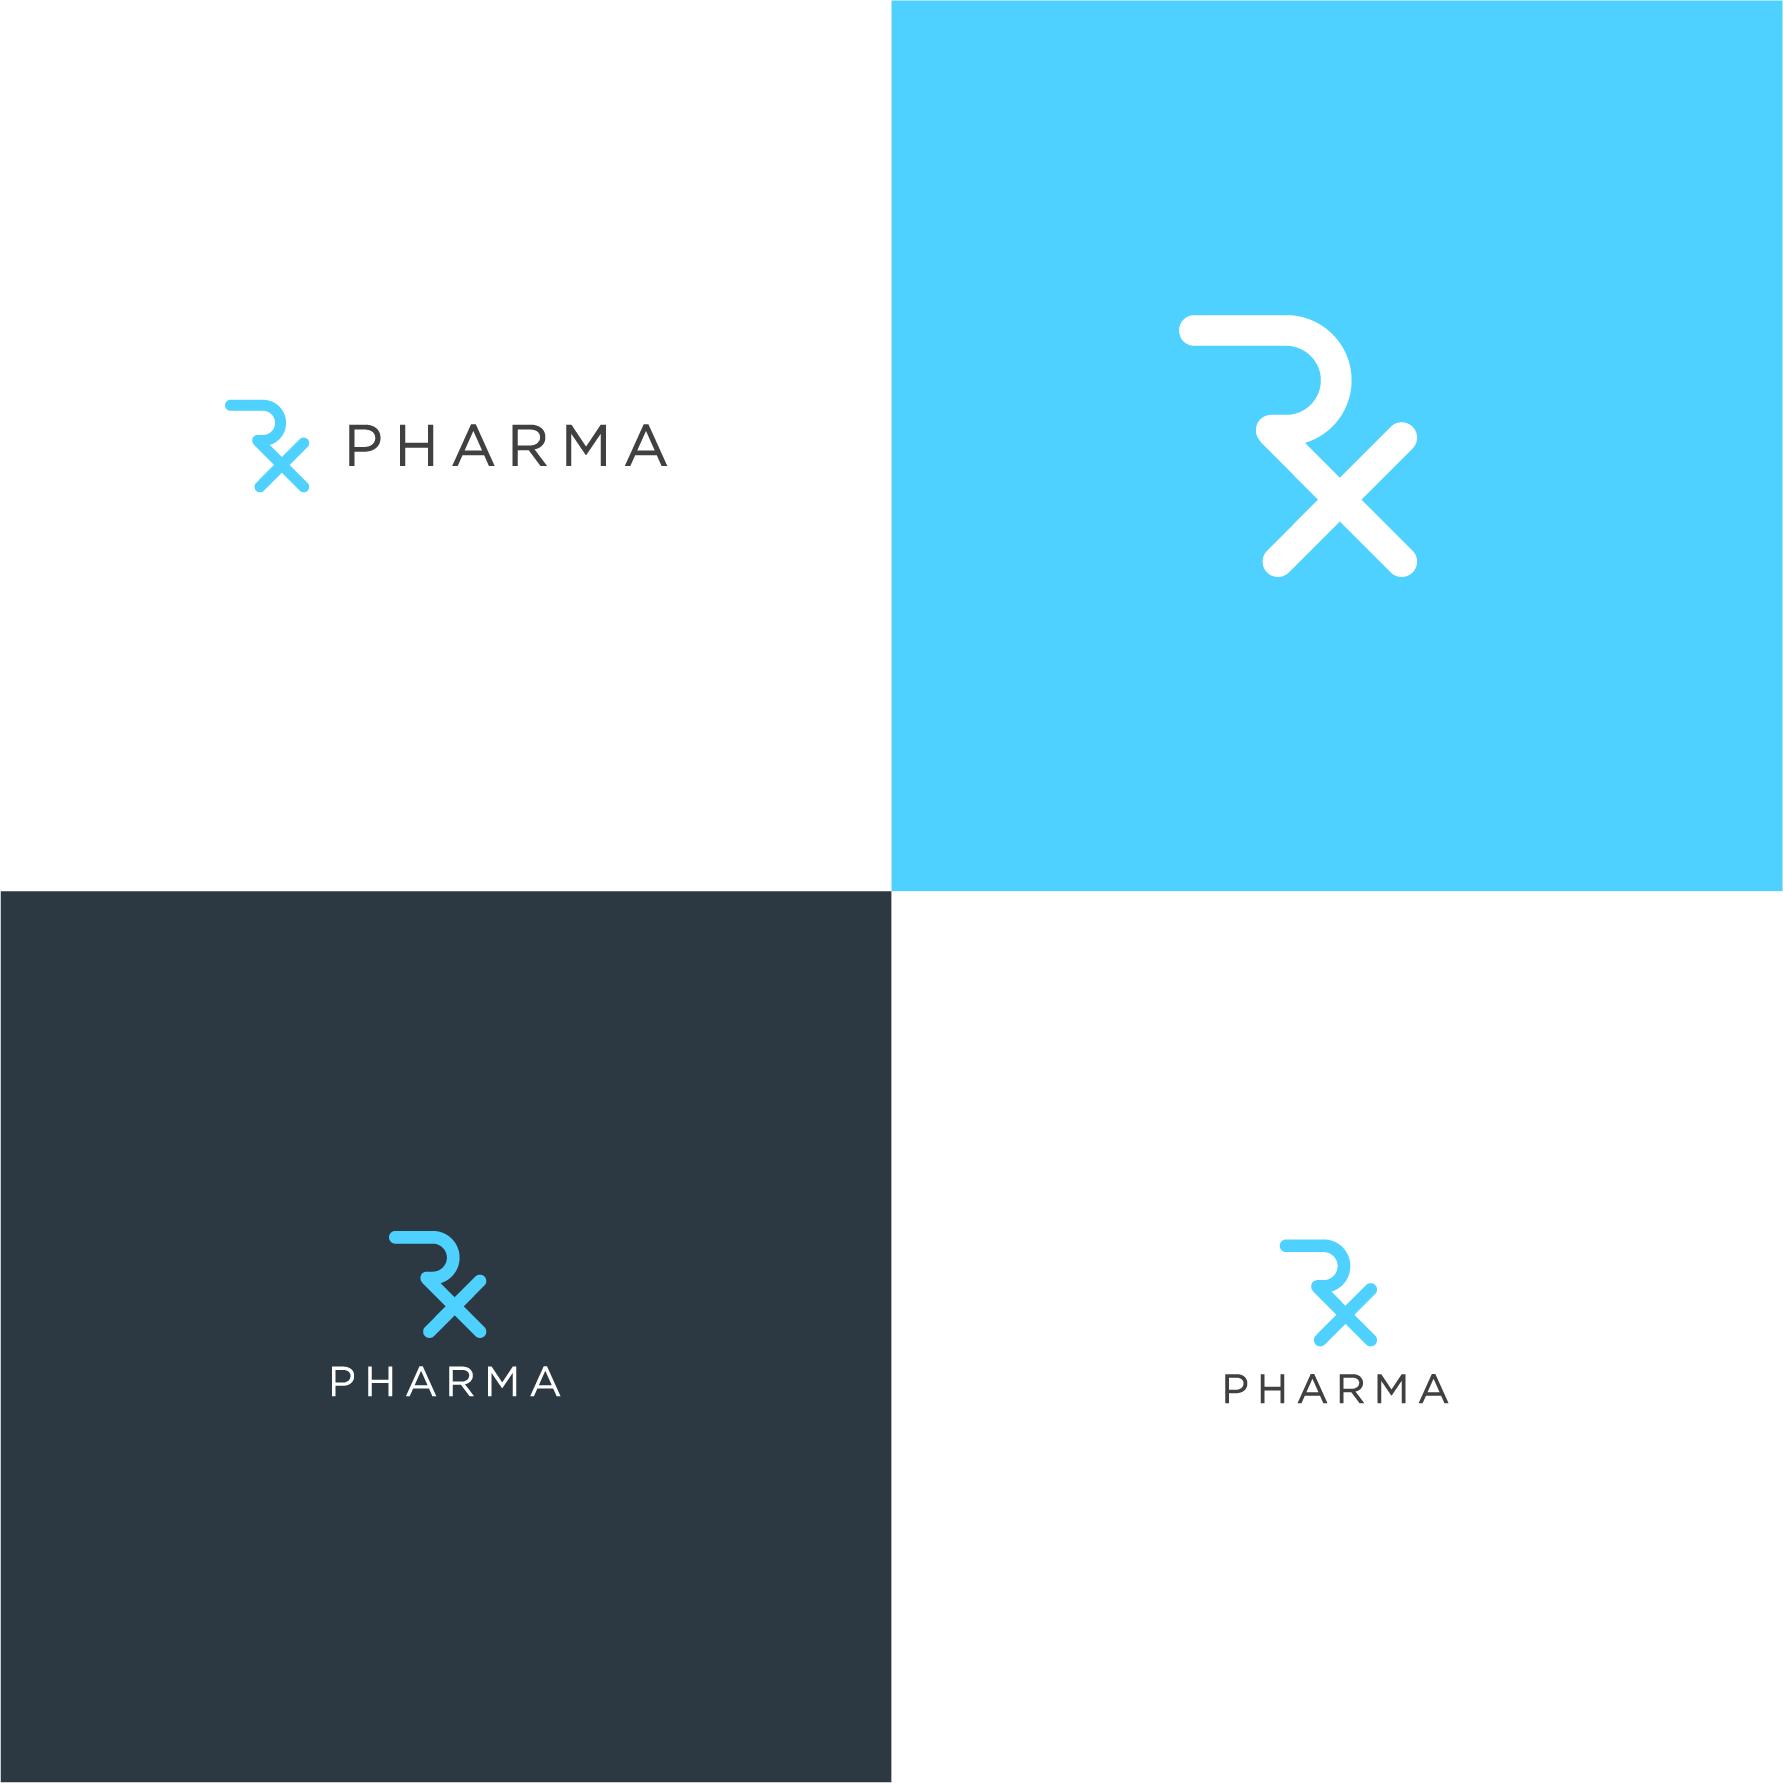 Design a professional logo for a pharmaceutical company